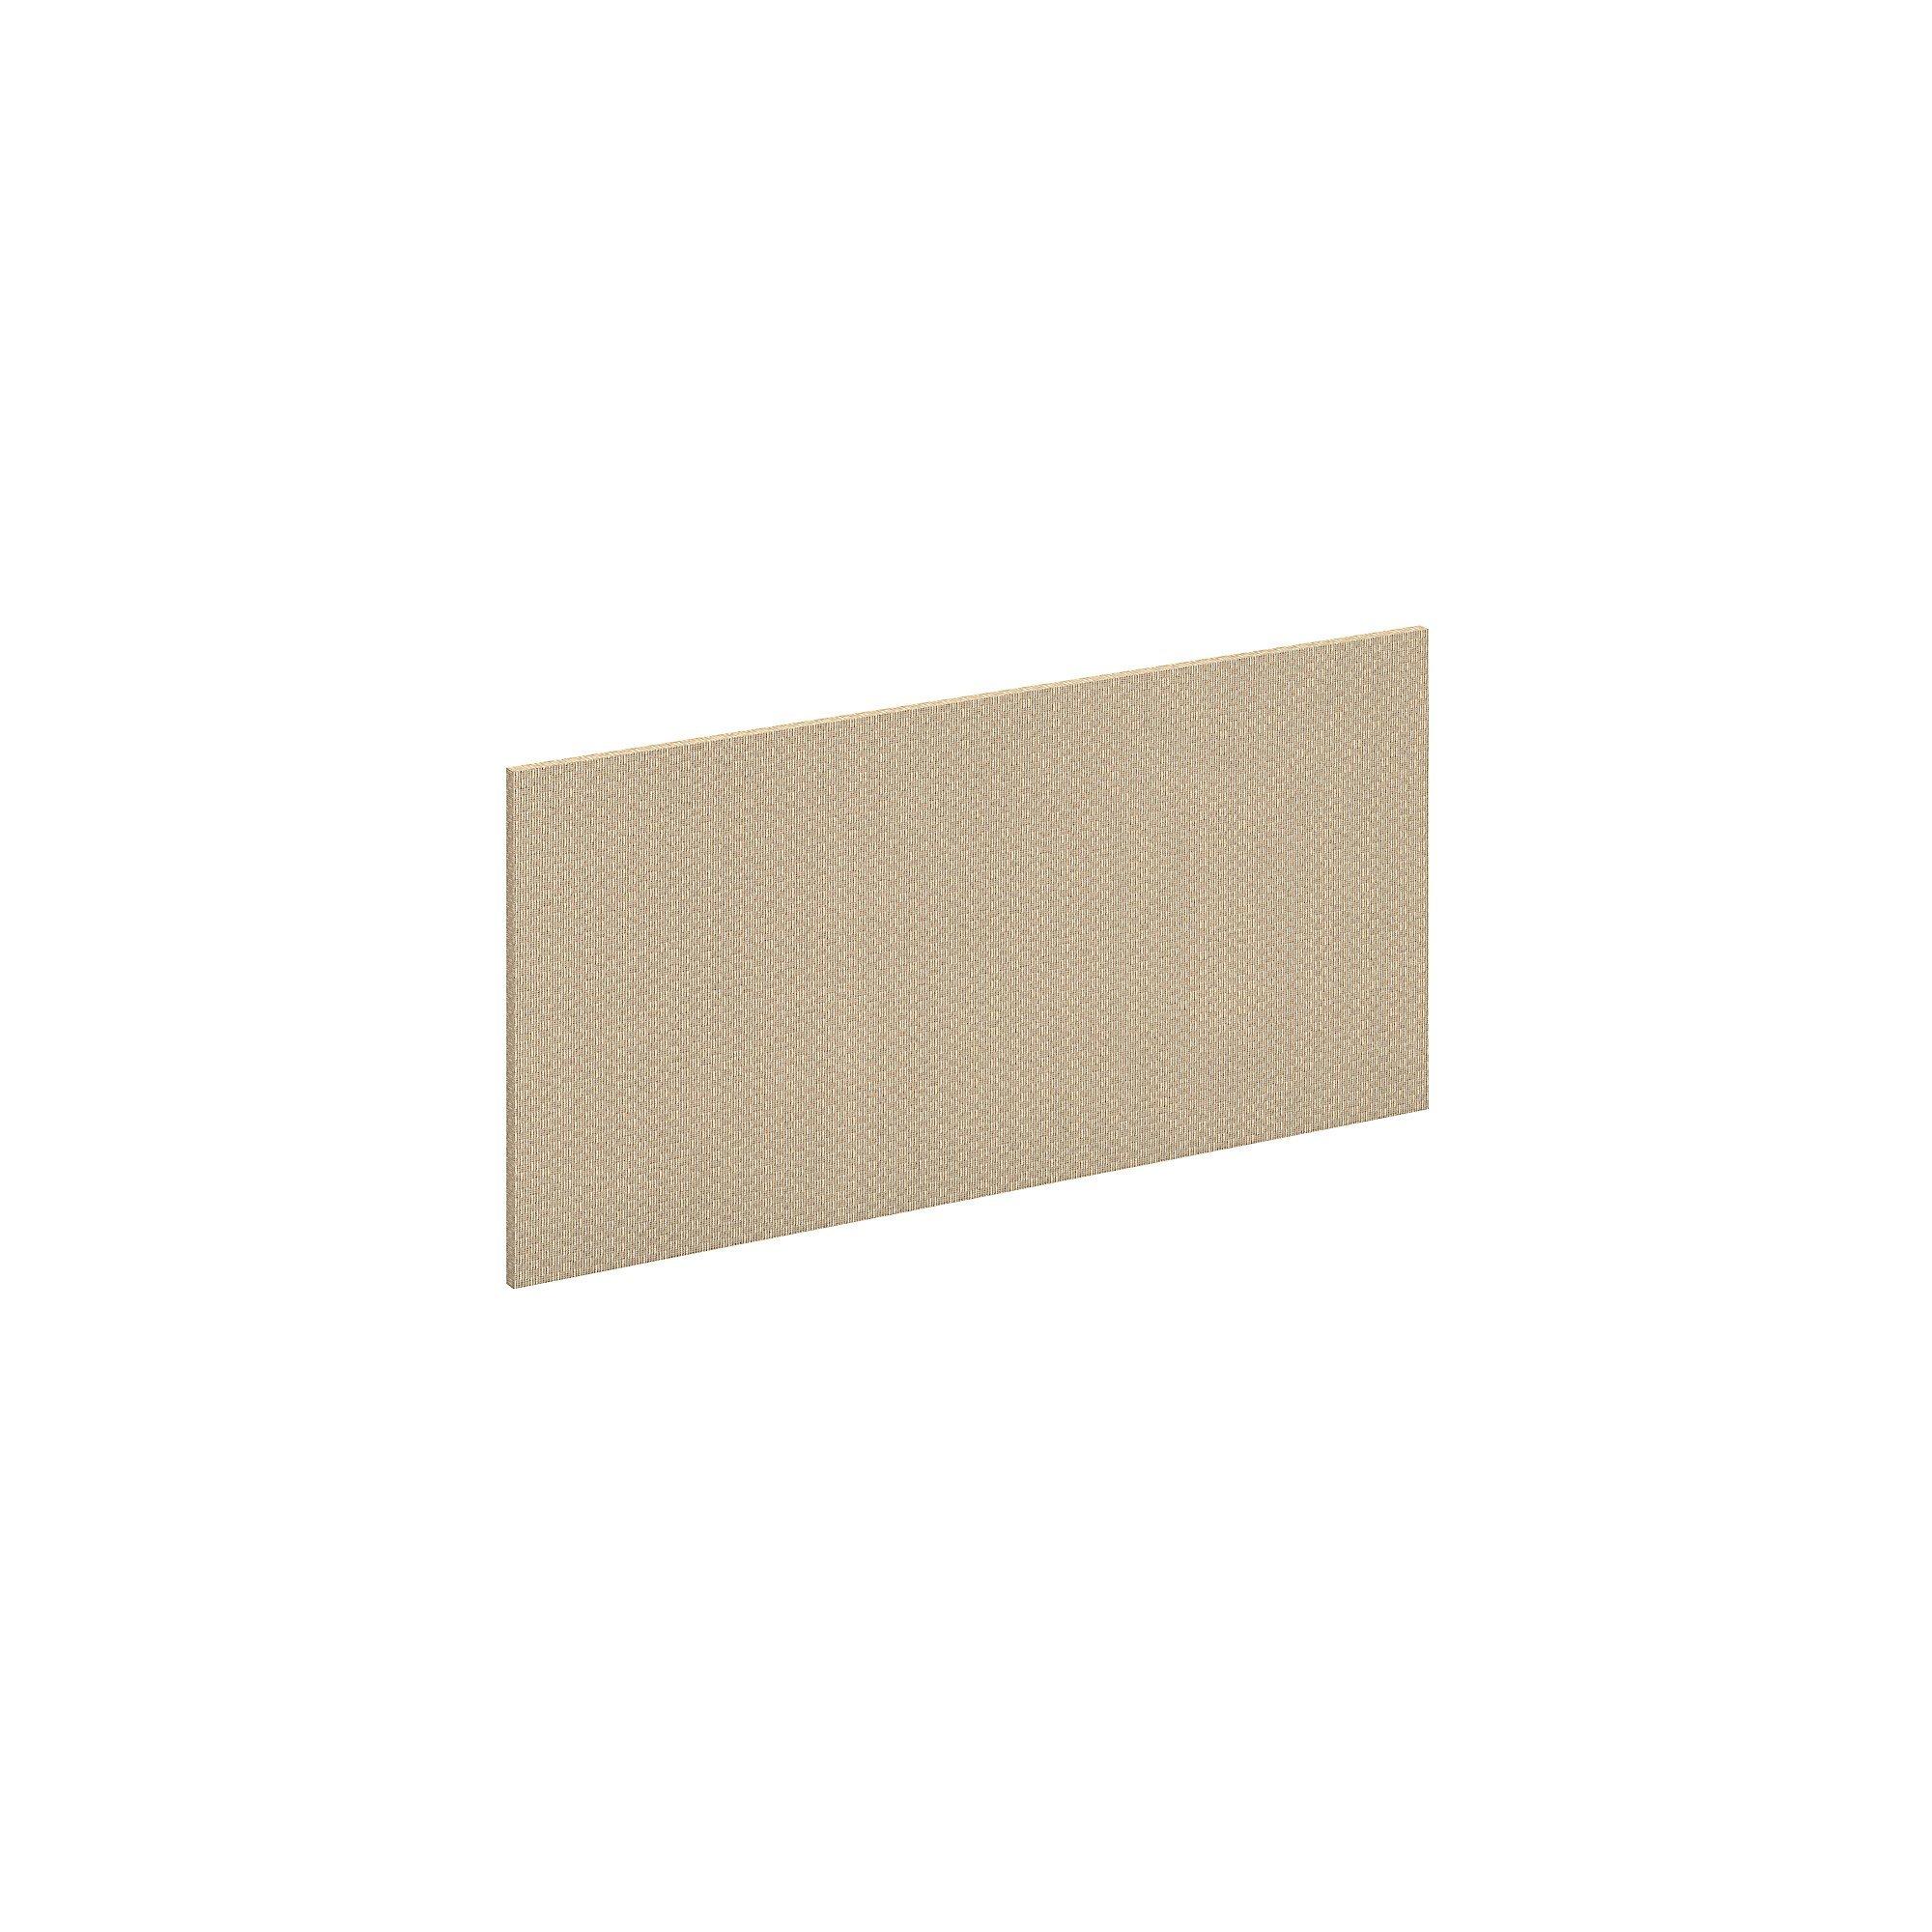 Bush Business Furniture Series C Elite 36W Tackboard in Lyric Sundew Fabric